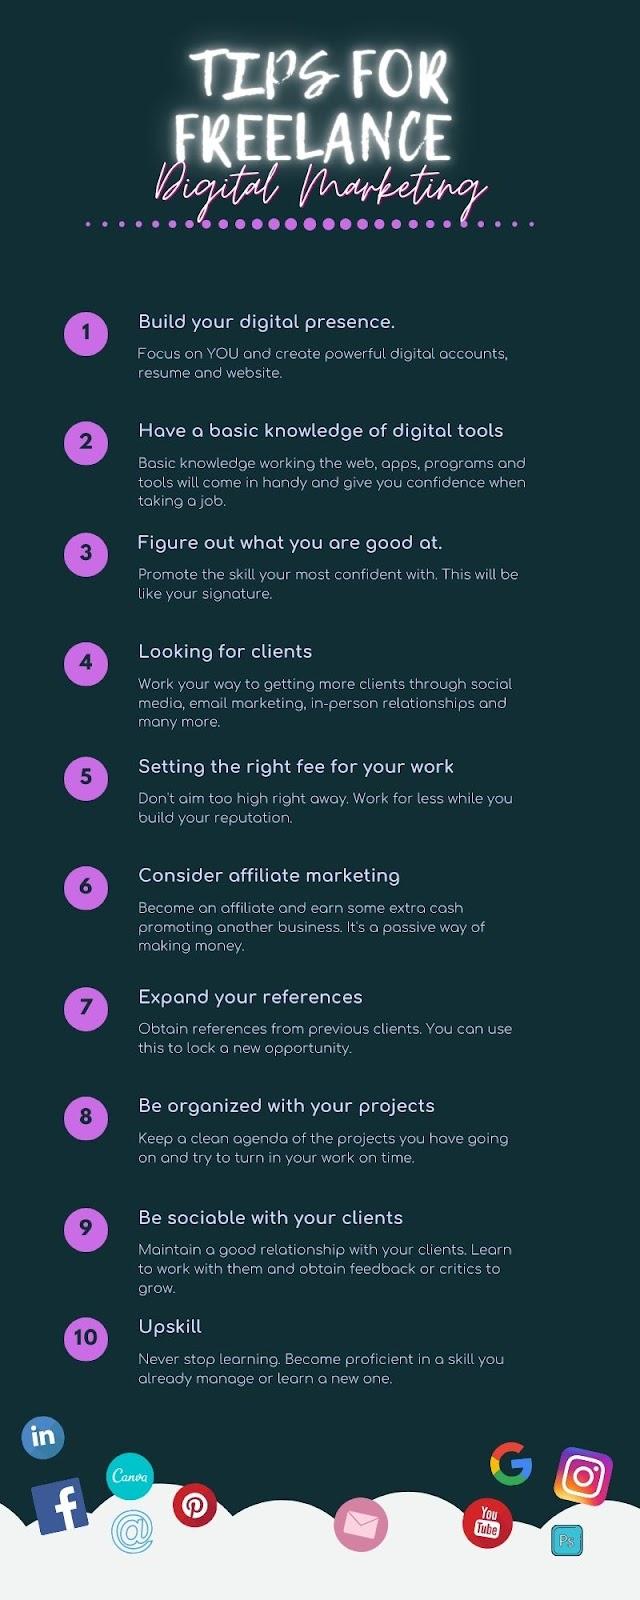 International Institute Of Digital Marketing™ - Digital Marketer - Tips for Freelance Digital Marketing